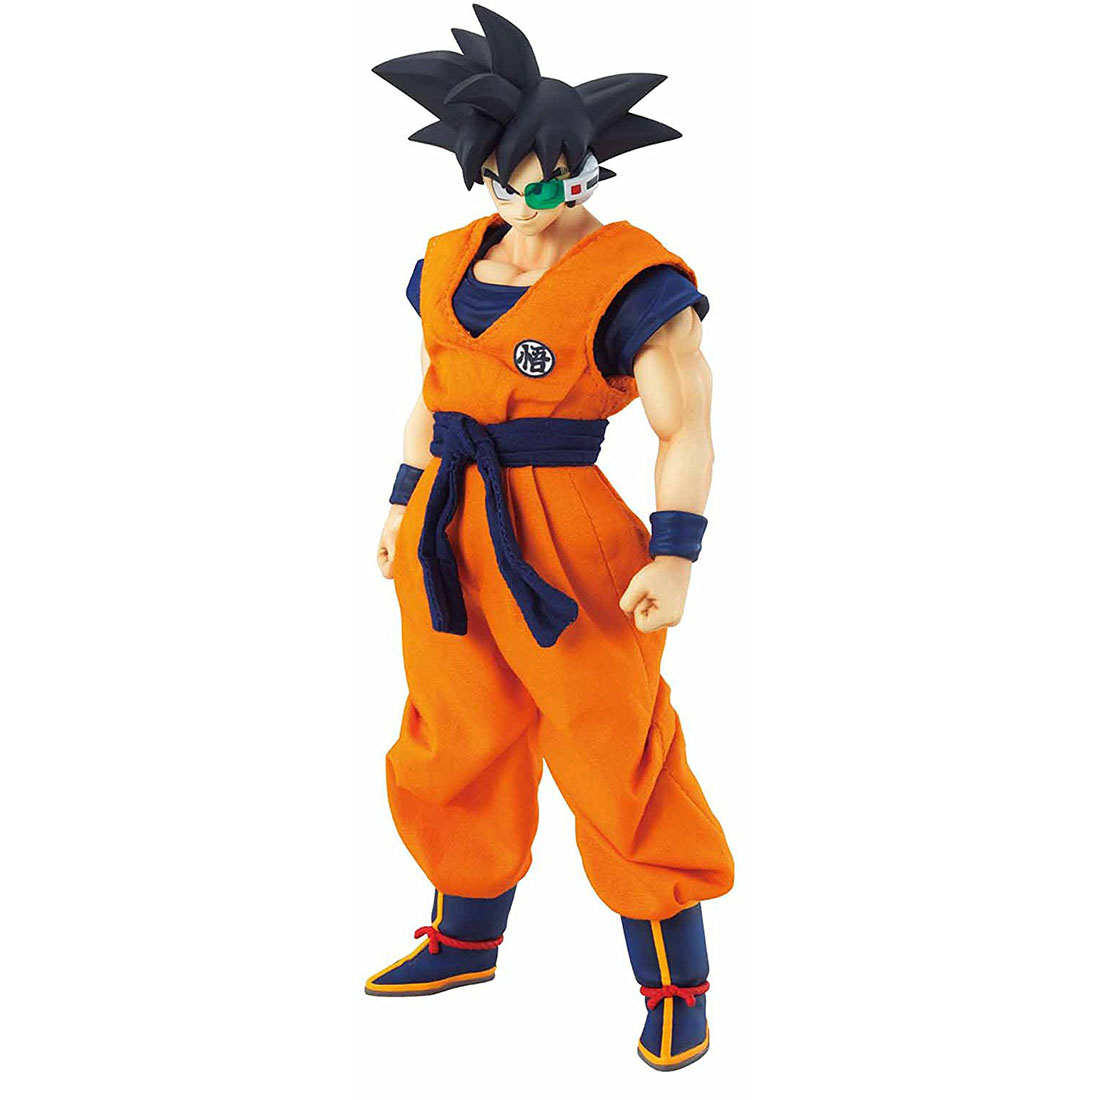 Dragon Ball Figure Dimensions Of Dragon Ball Figure Son